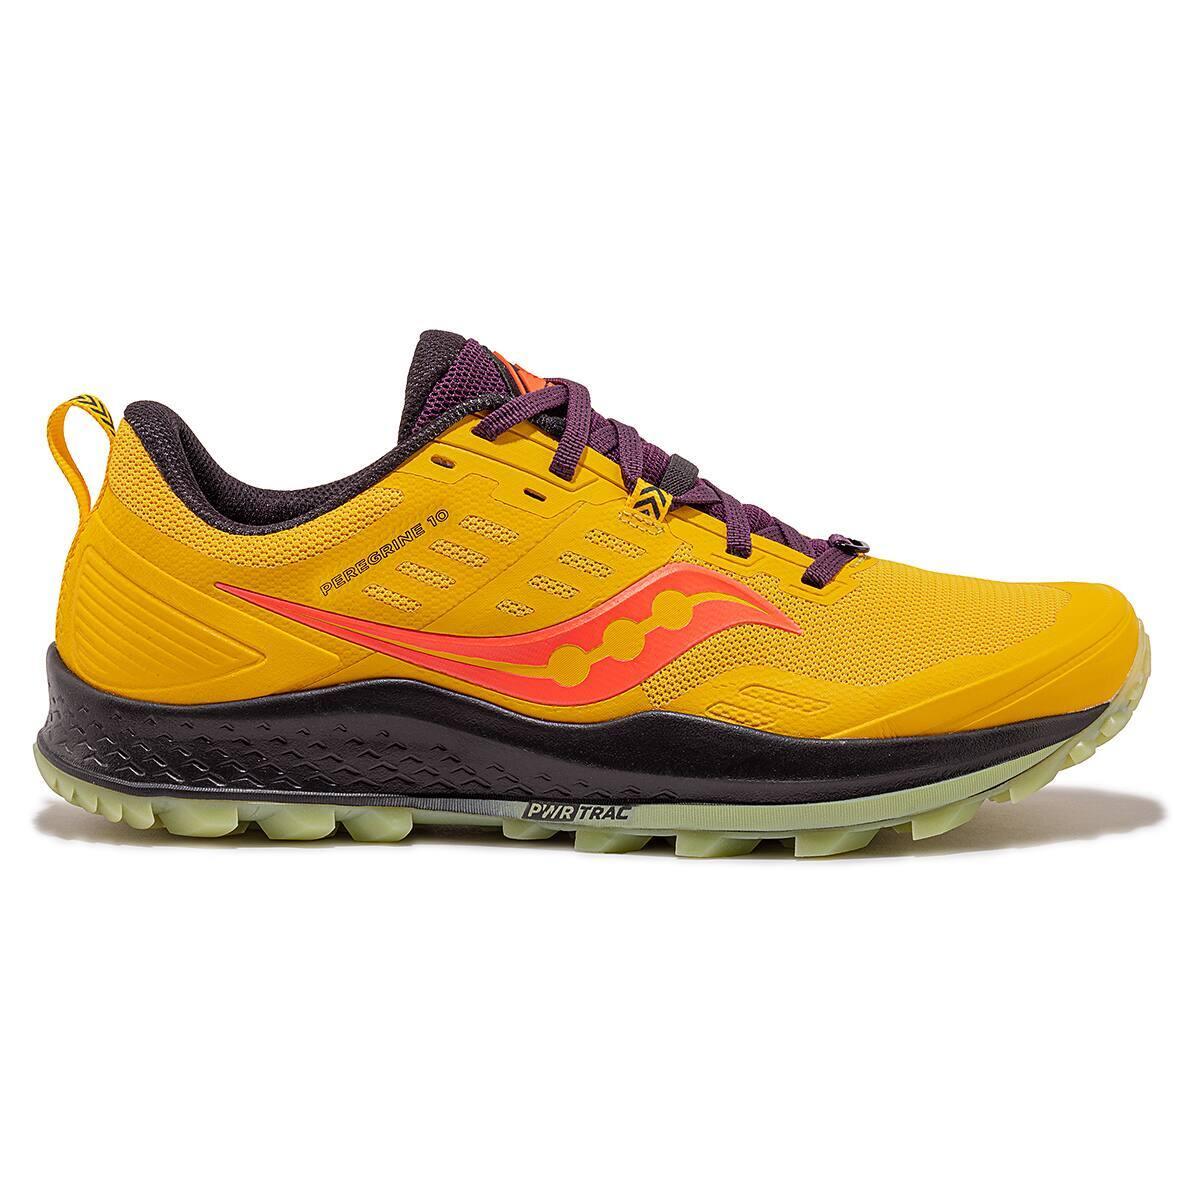 Saucony Jackalope 2.0 Peregrine 10 Trail Running Shoe $71.98 + Free Shipping